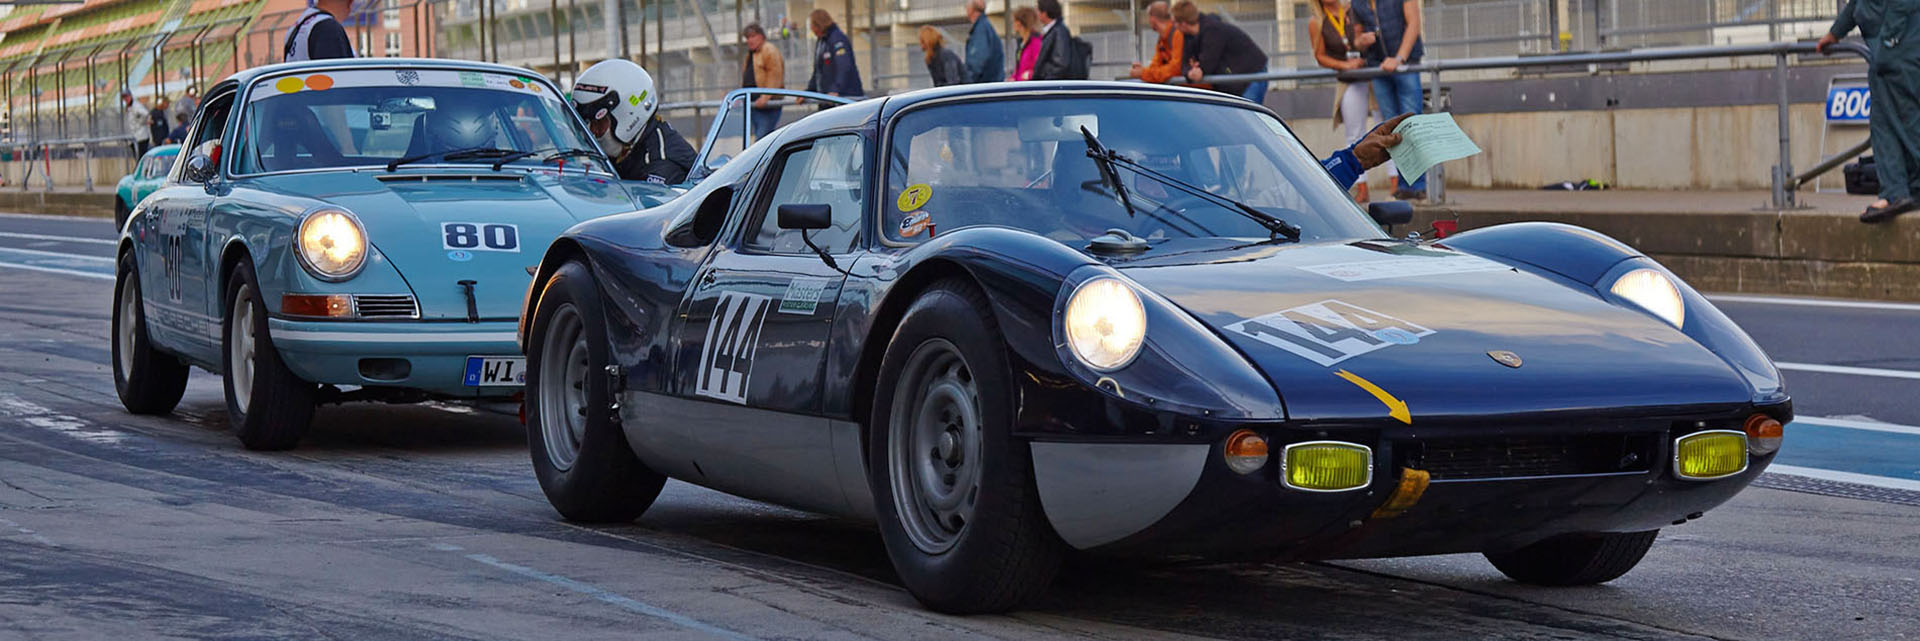 Fotodesign-matthias-schütz-racing-porsche-907-911